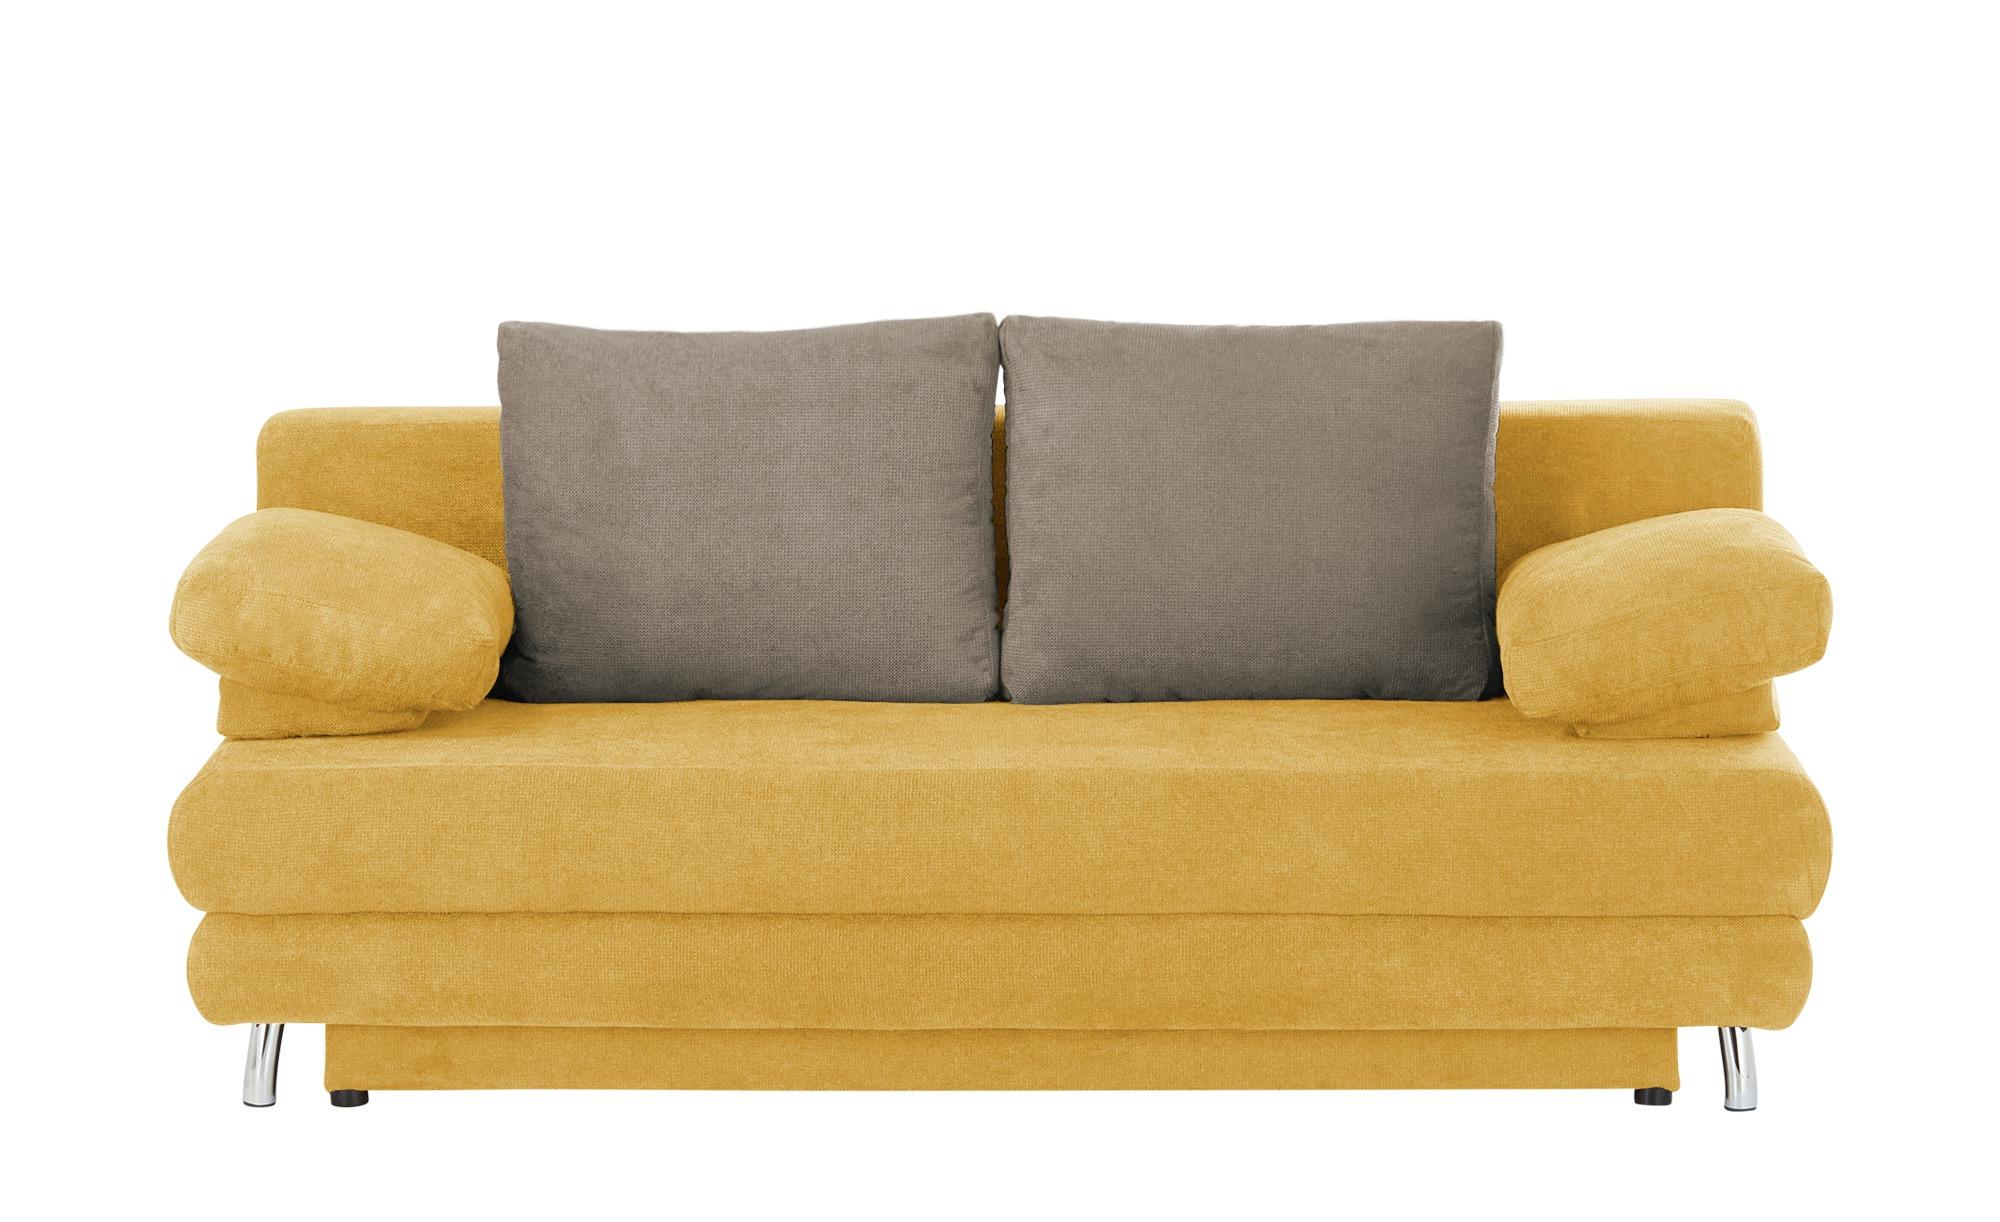 Schlafsofa  Calina ¦ gelb ¦ Maße (cm): B: 205 H: 80 T: 100 Polstermöbel > Sofas > 2-Sitzer - Höffner